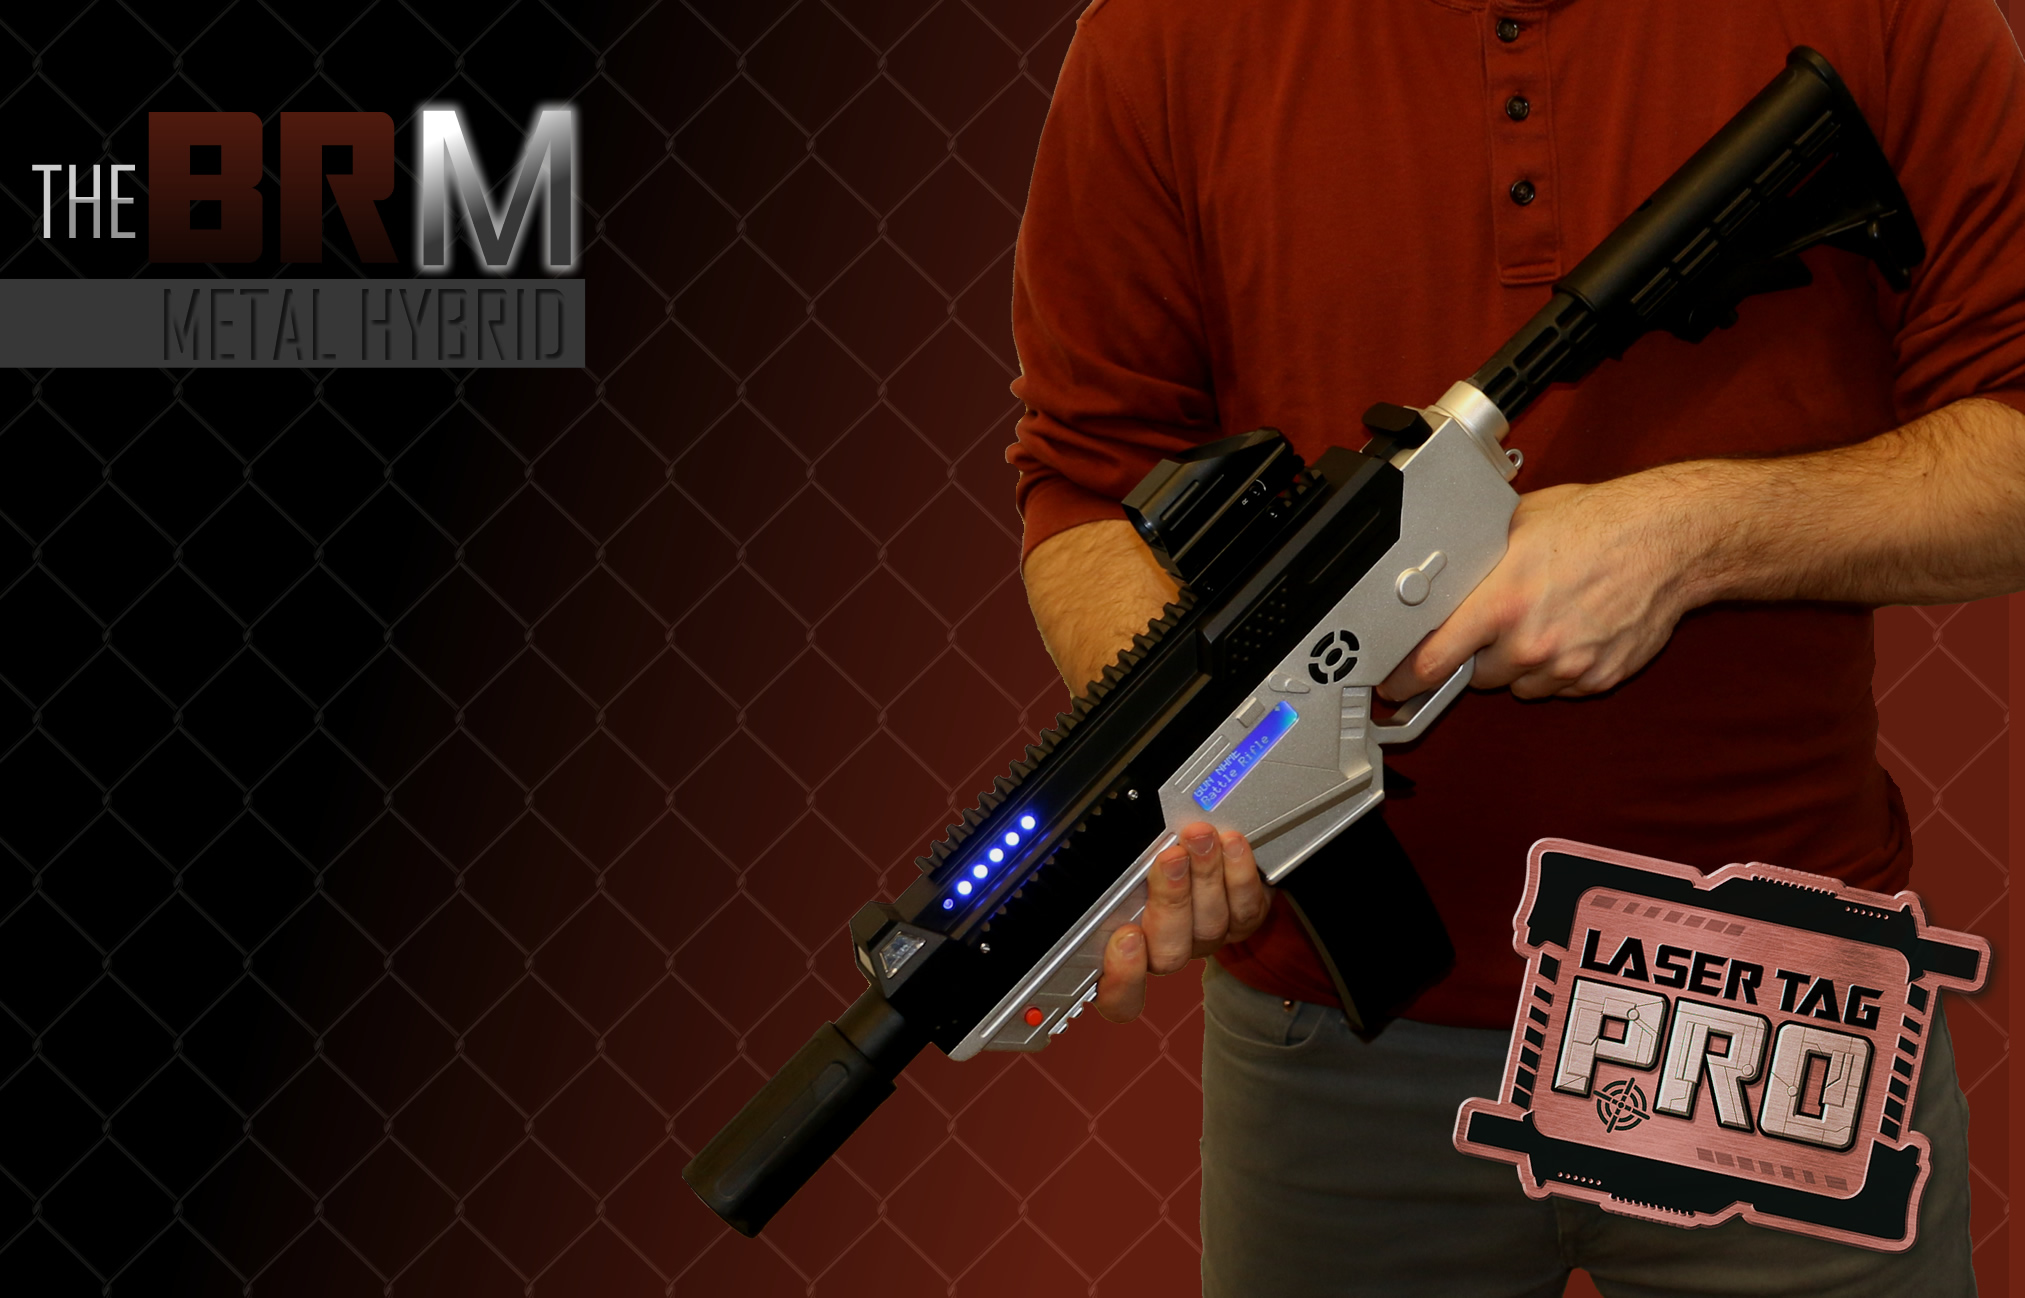 Brm Metal Hybrid Laser Tag Gun Laser Tag Pro Indoor